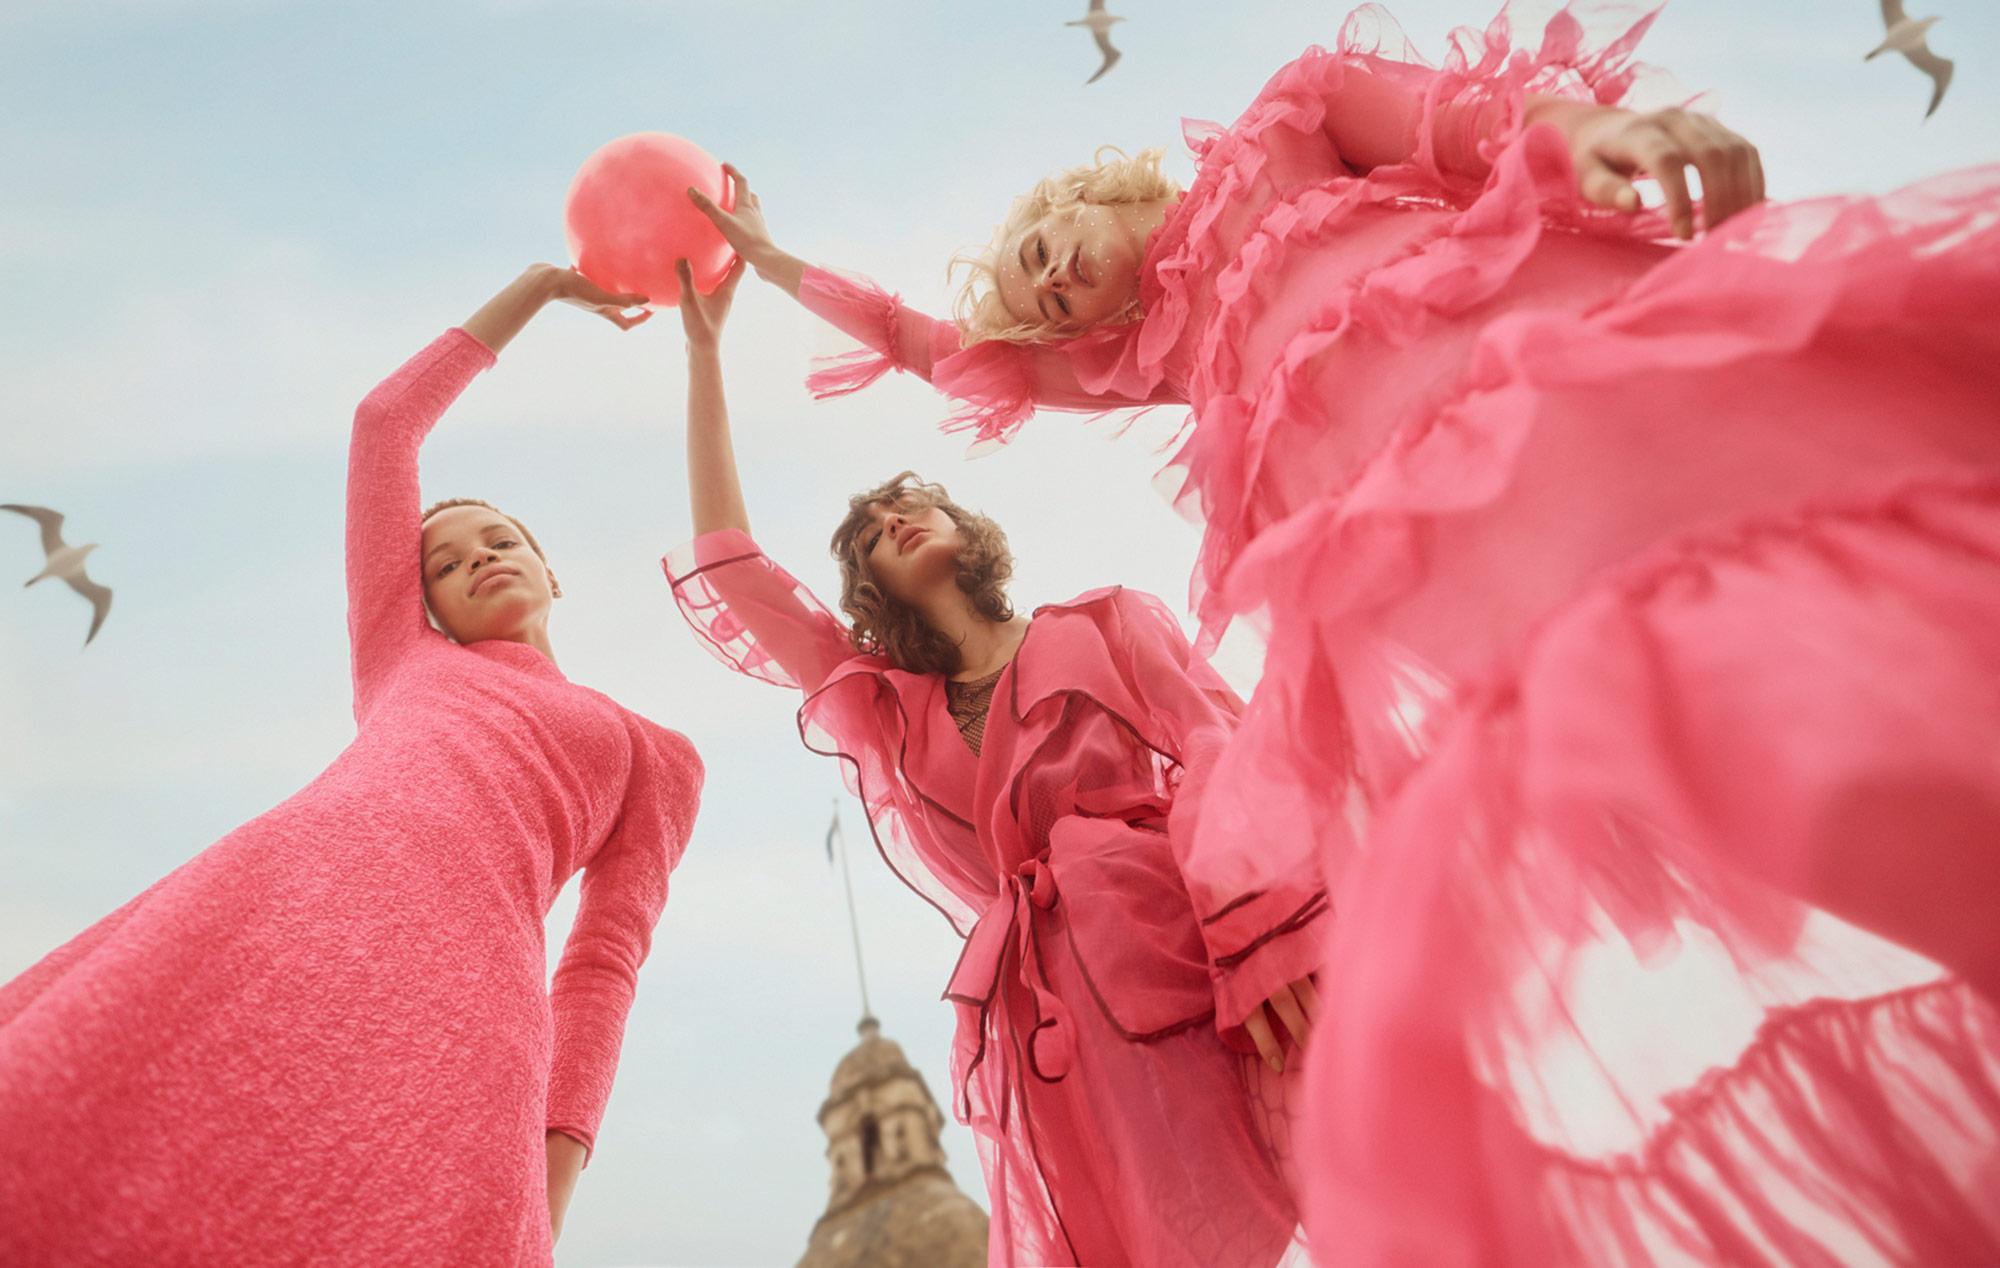 Melb Fashion Festival 7v3 (grain).jpg